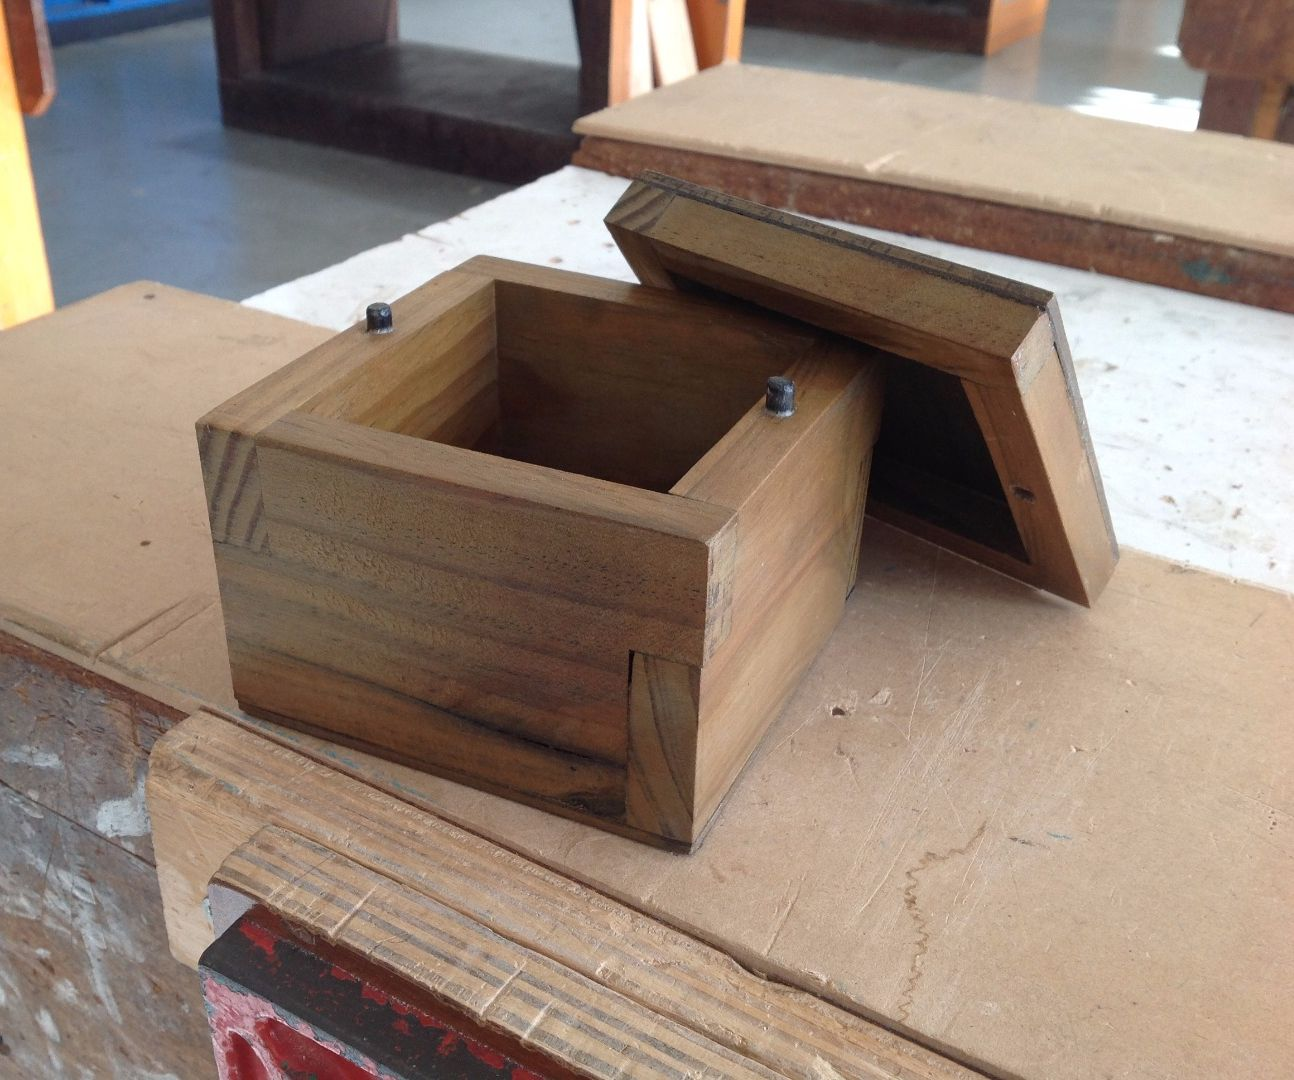 Small wooden box